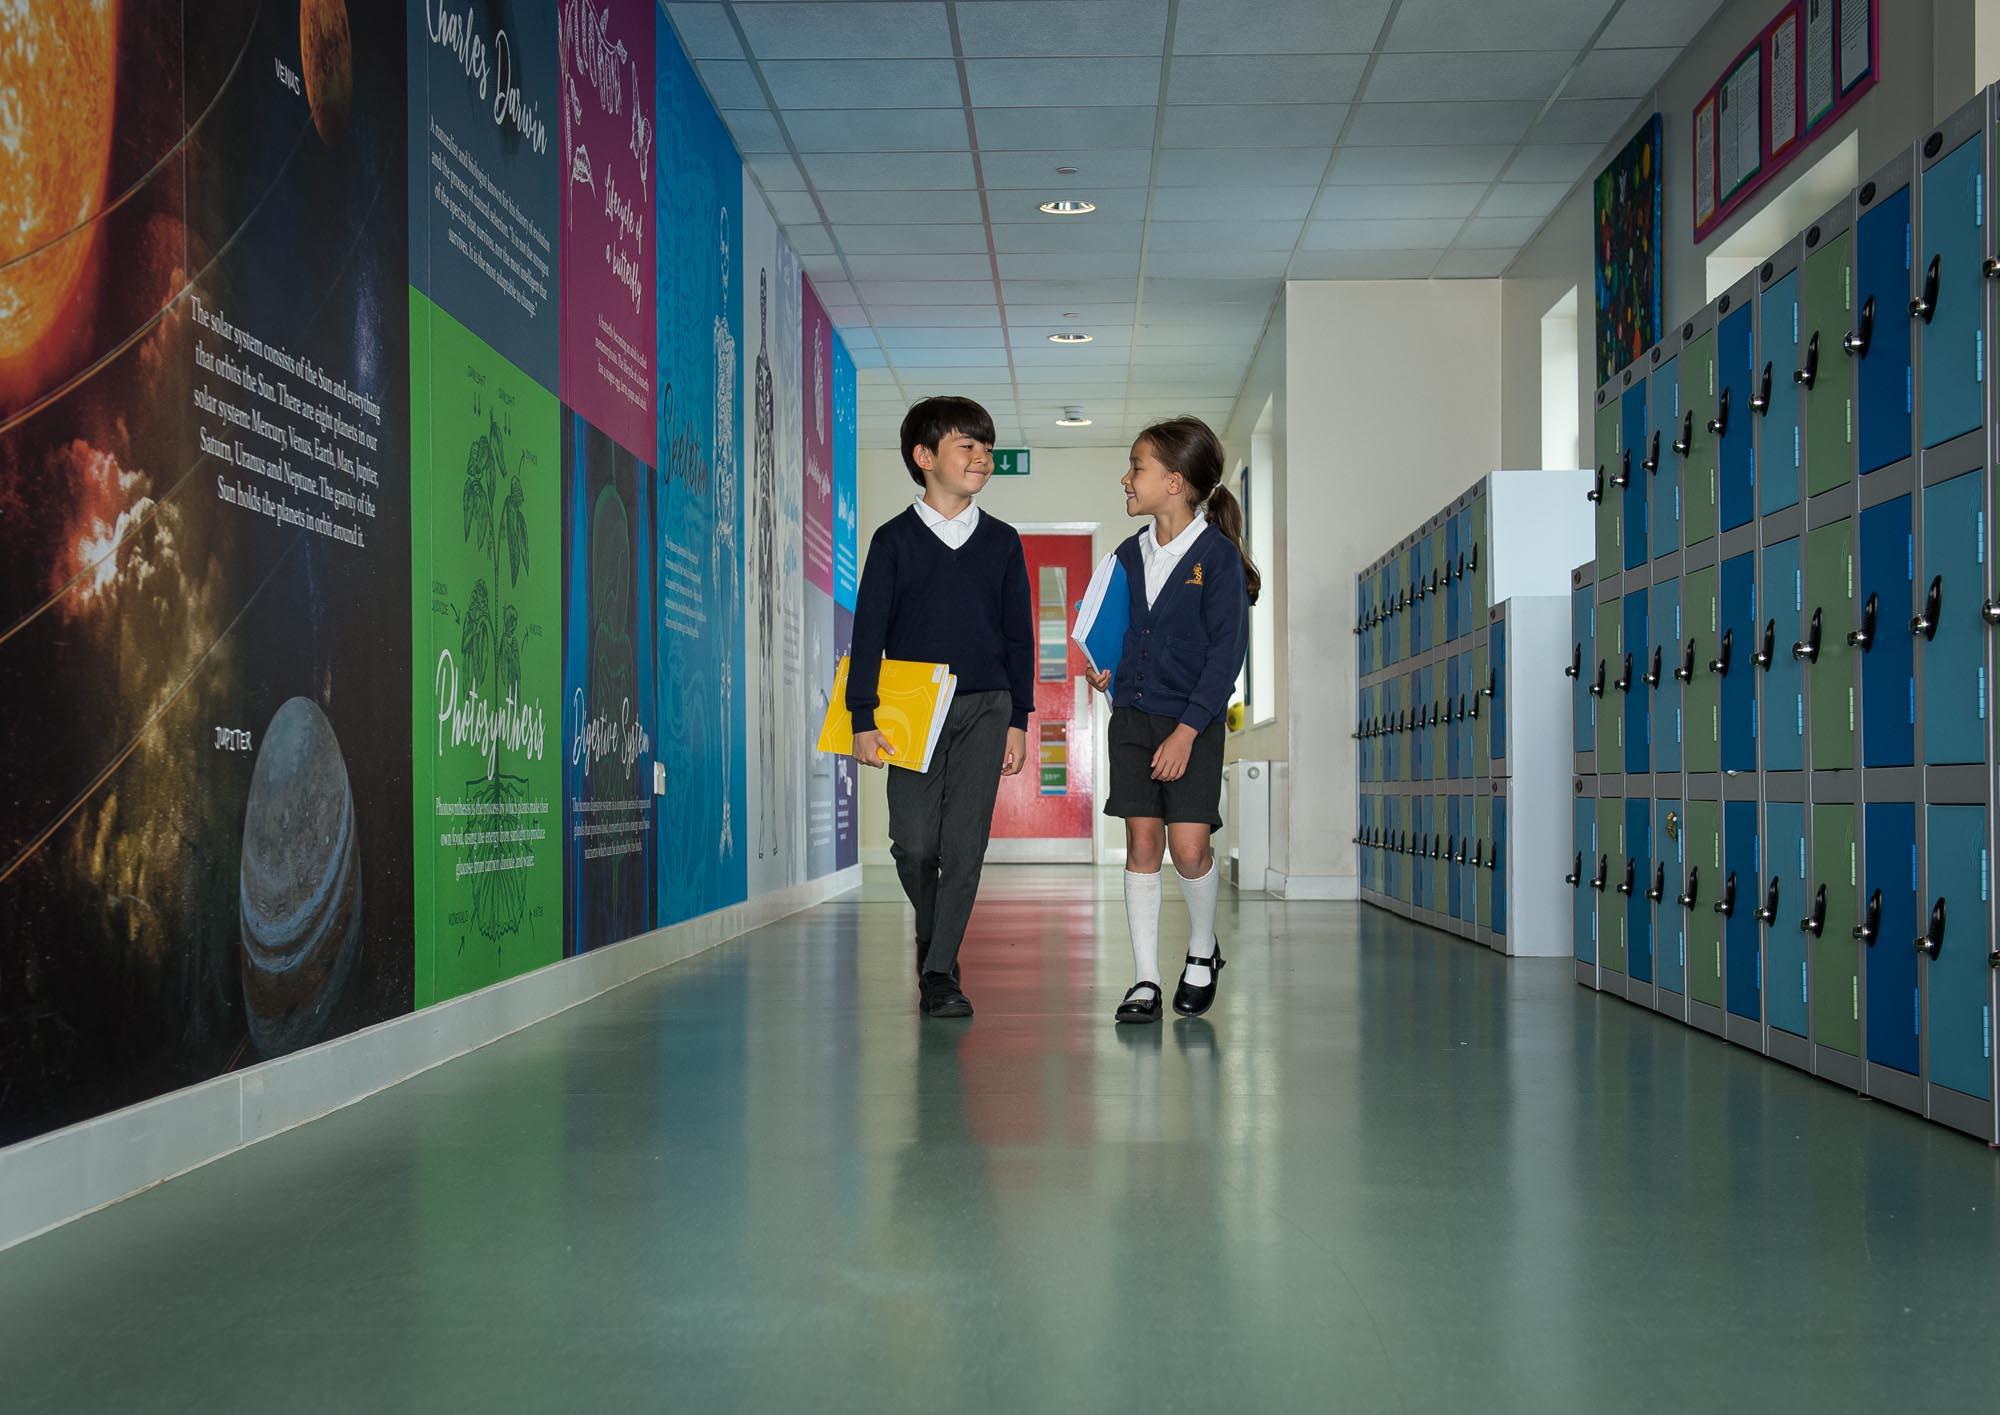 Boy and girl walking in science corridor